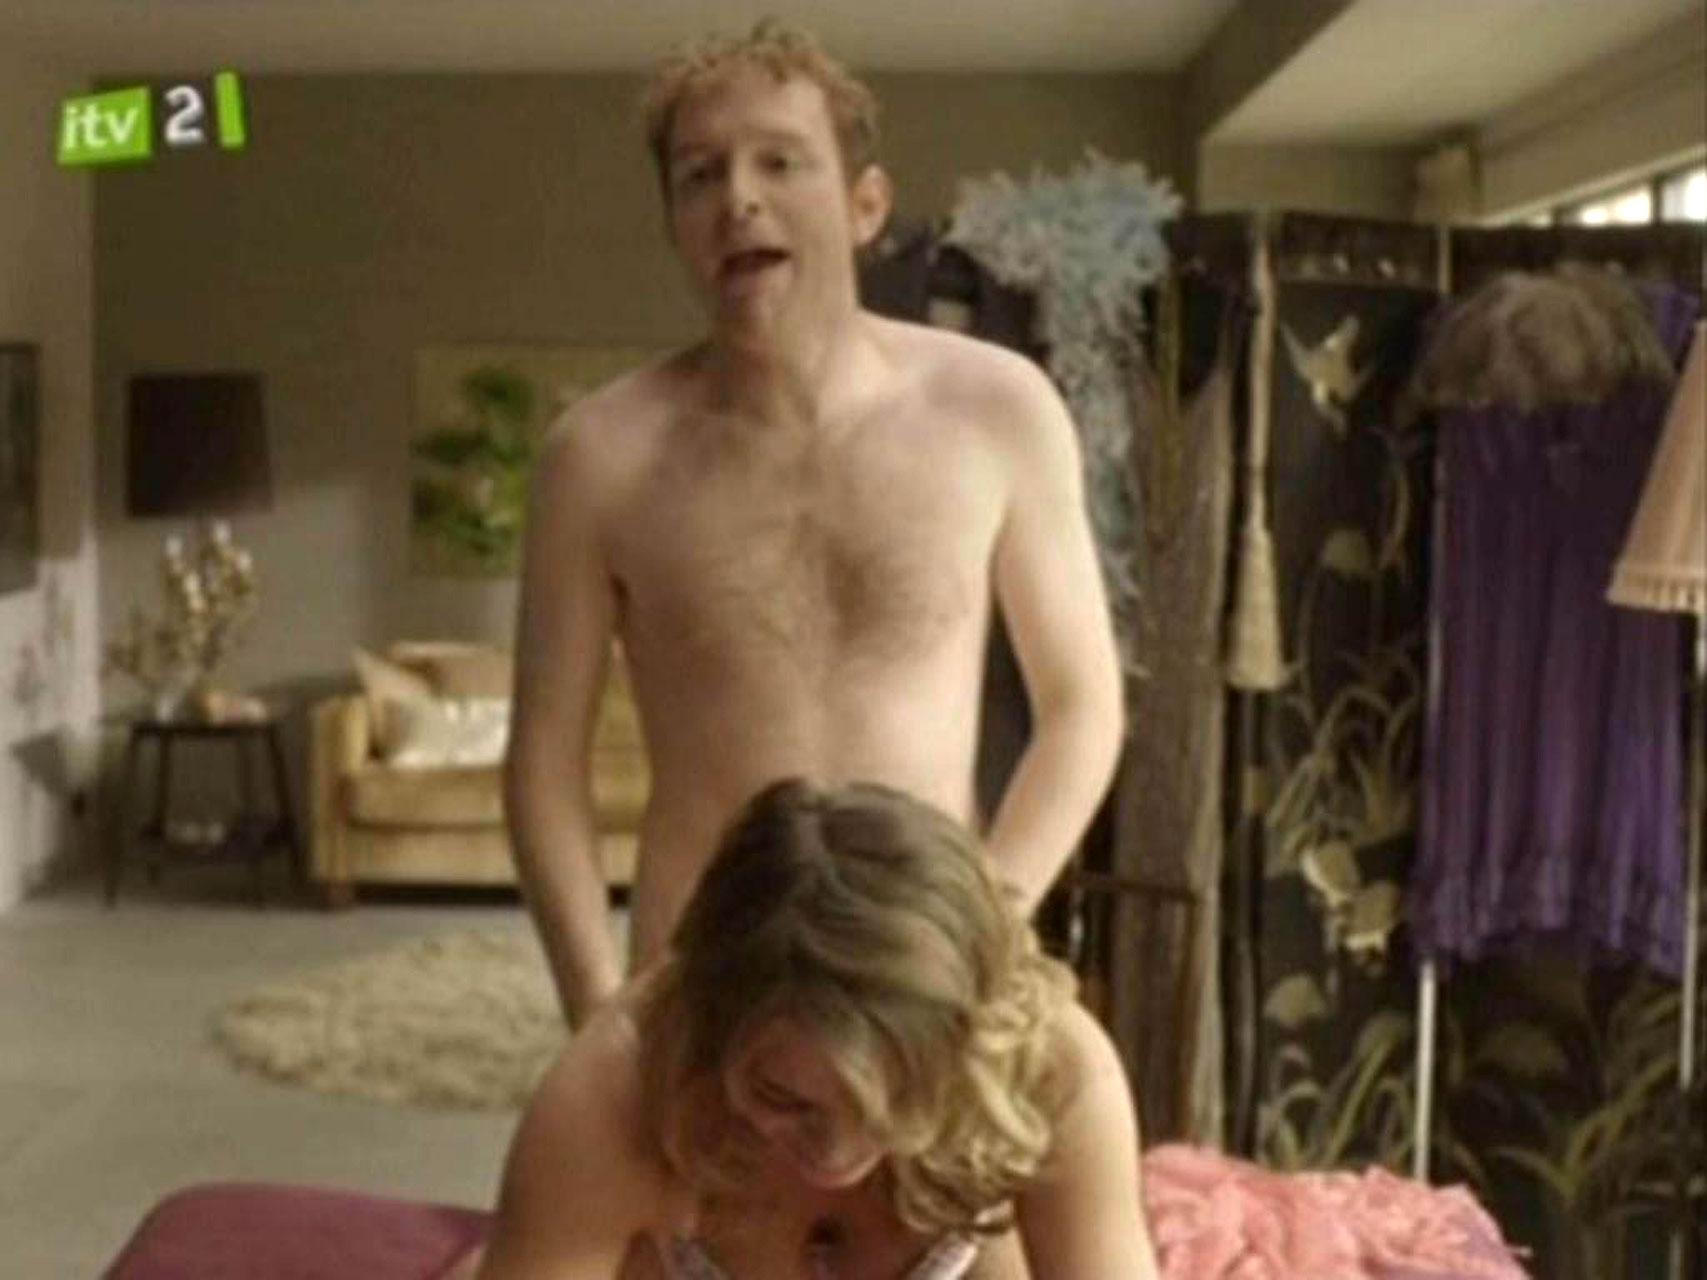 Billie piper nude boobs